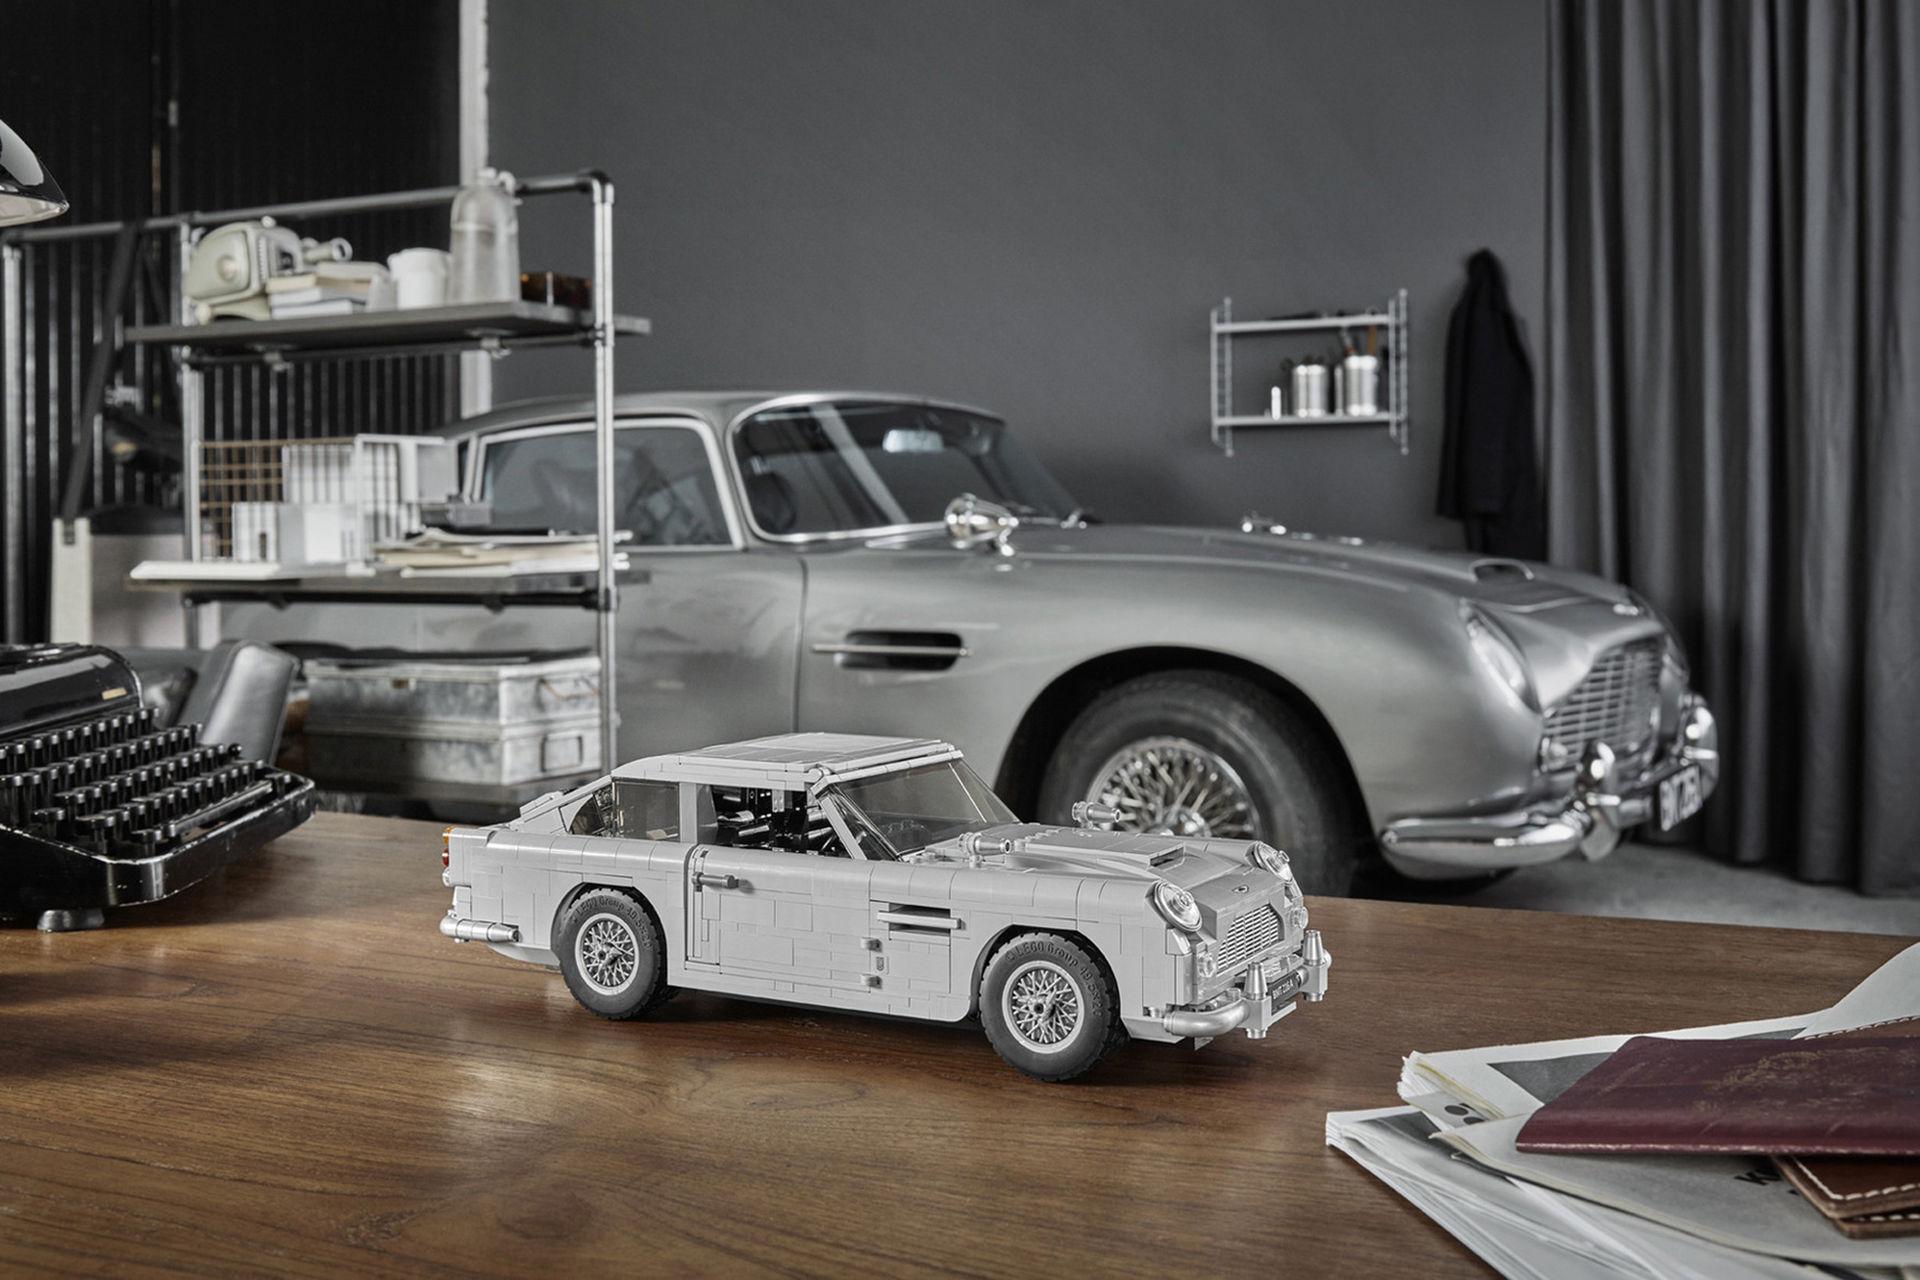 Lego-version av James Bonds Aston Martin DB5